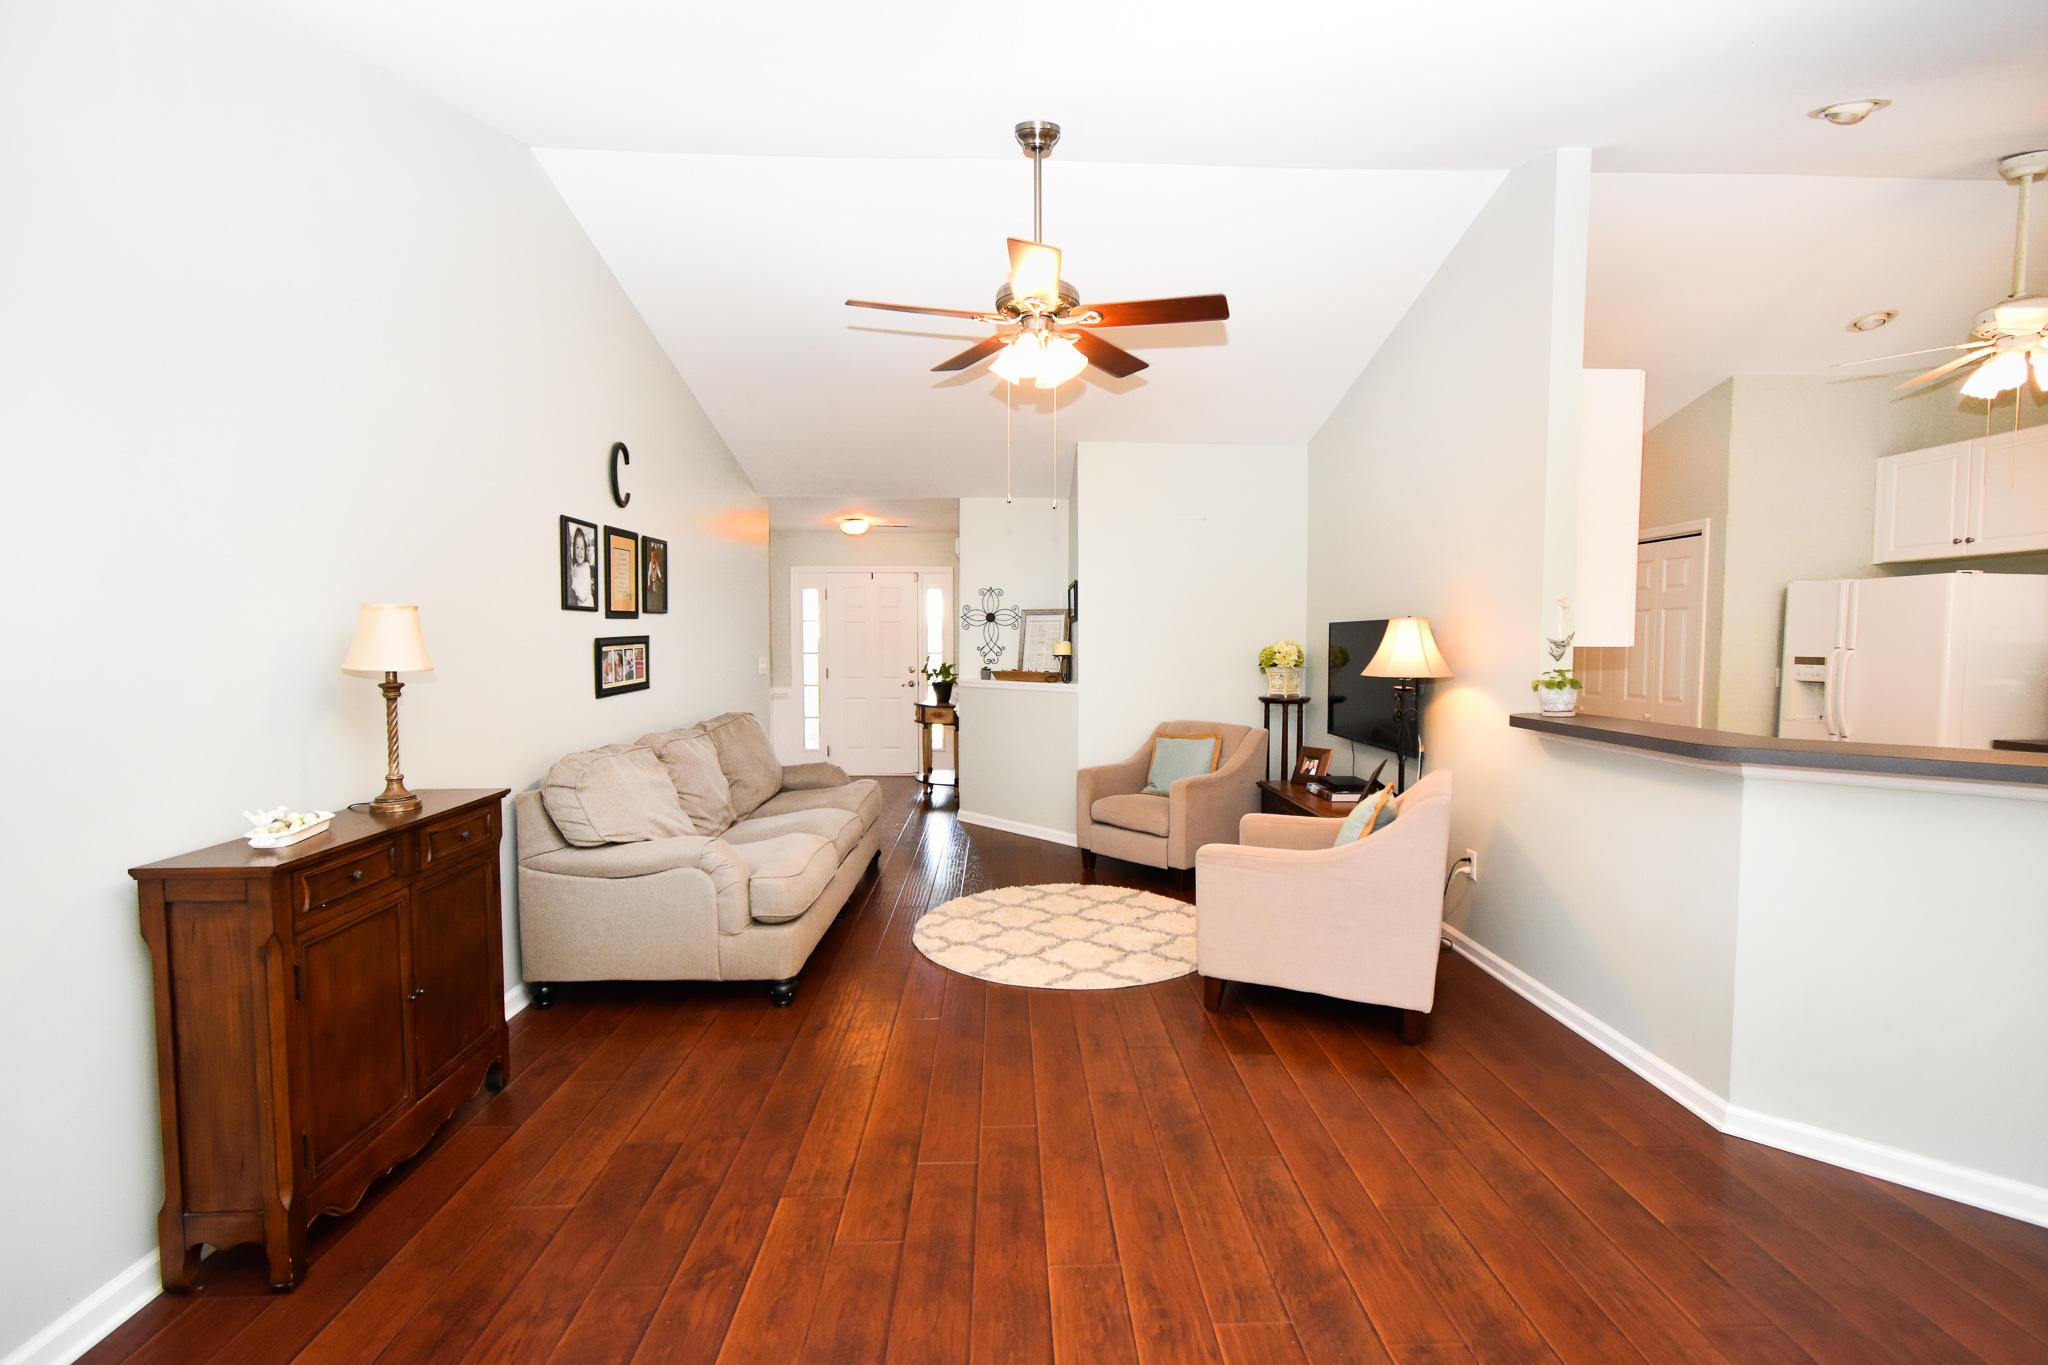 Park West Homes For Sale - 1444 Wellesley, Mount Pleasant, SC - 27